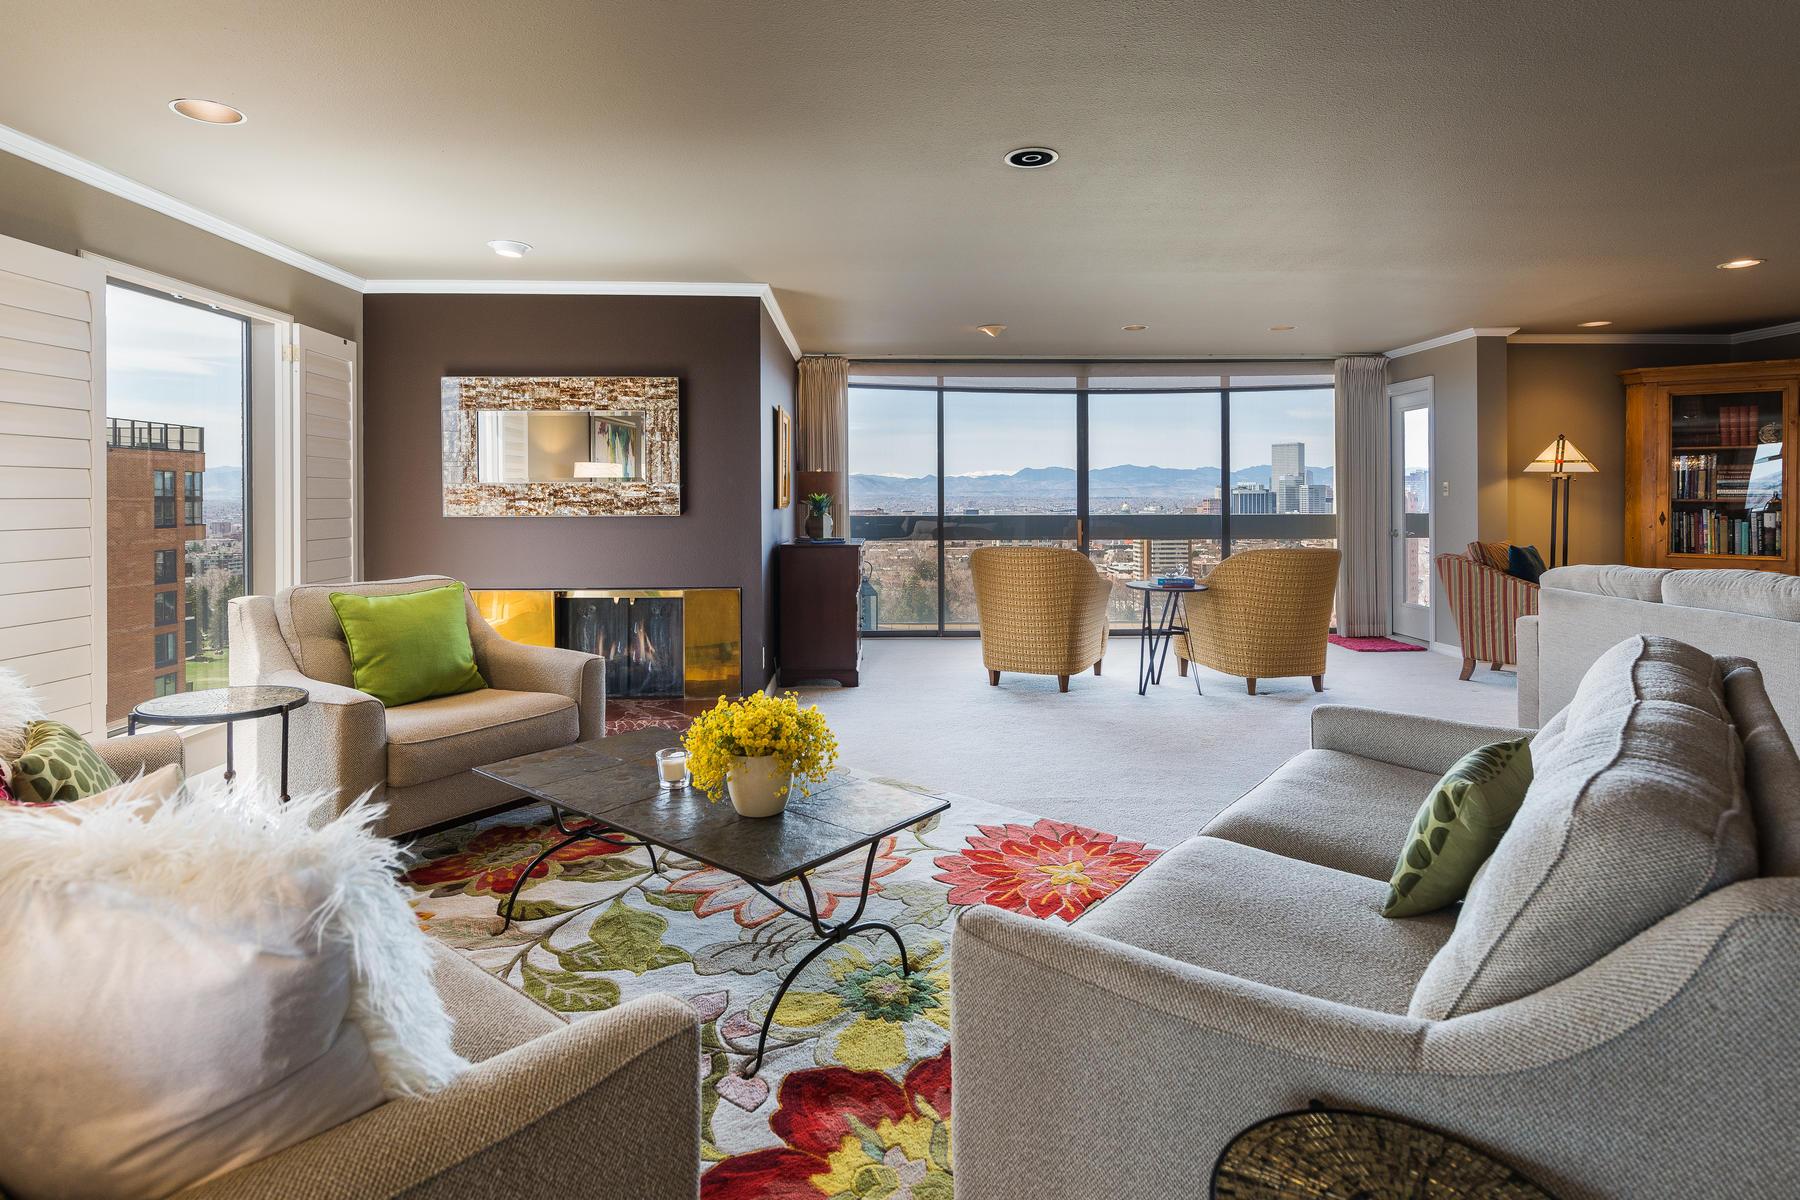 Condominium for Active at Open, Spacious & Private 2000 East 12th Avenue #21B Denver, Colorado 80206 United States